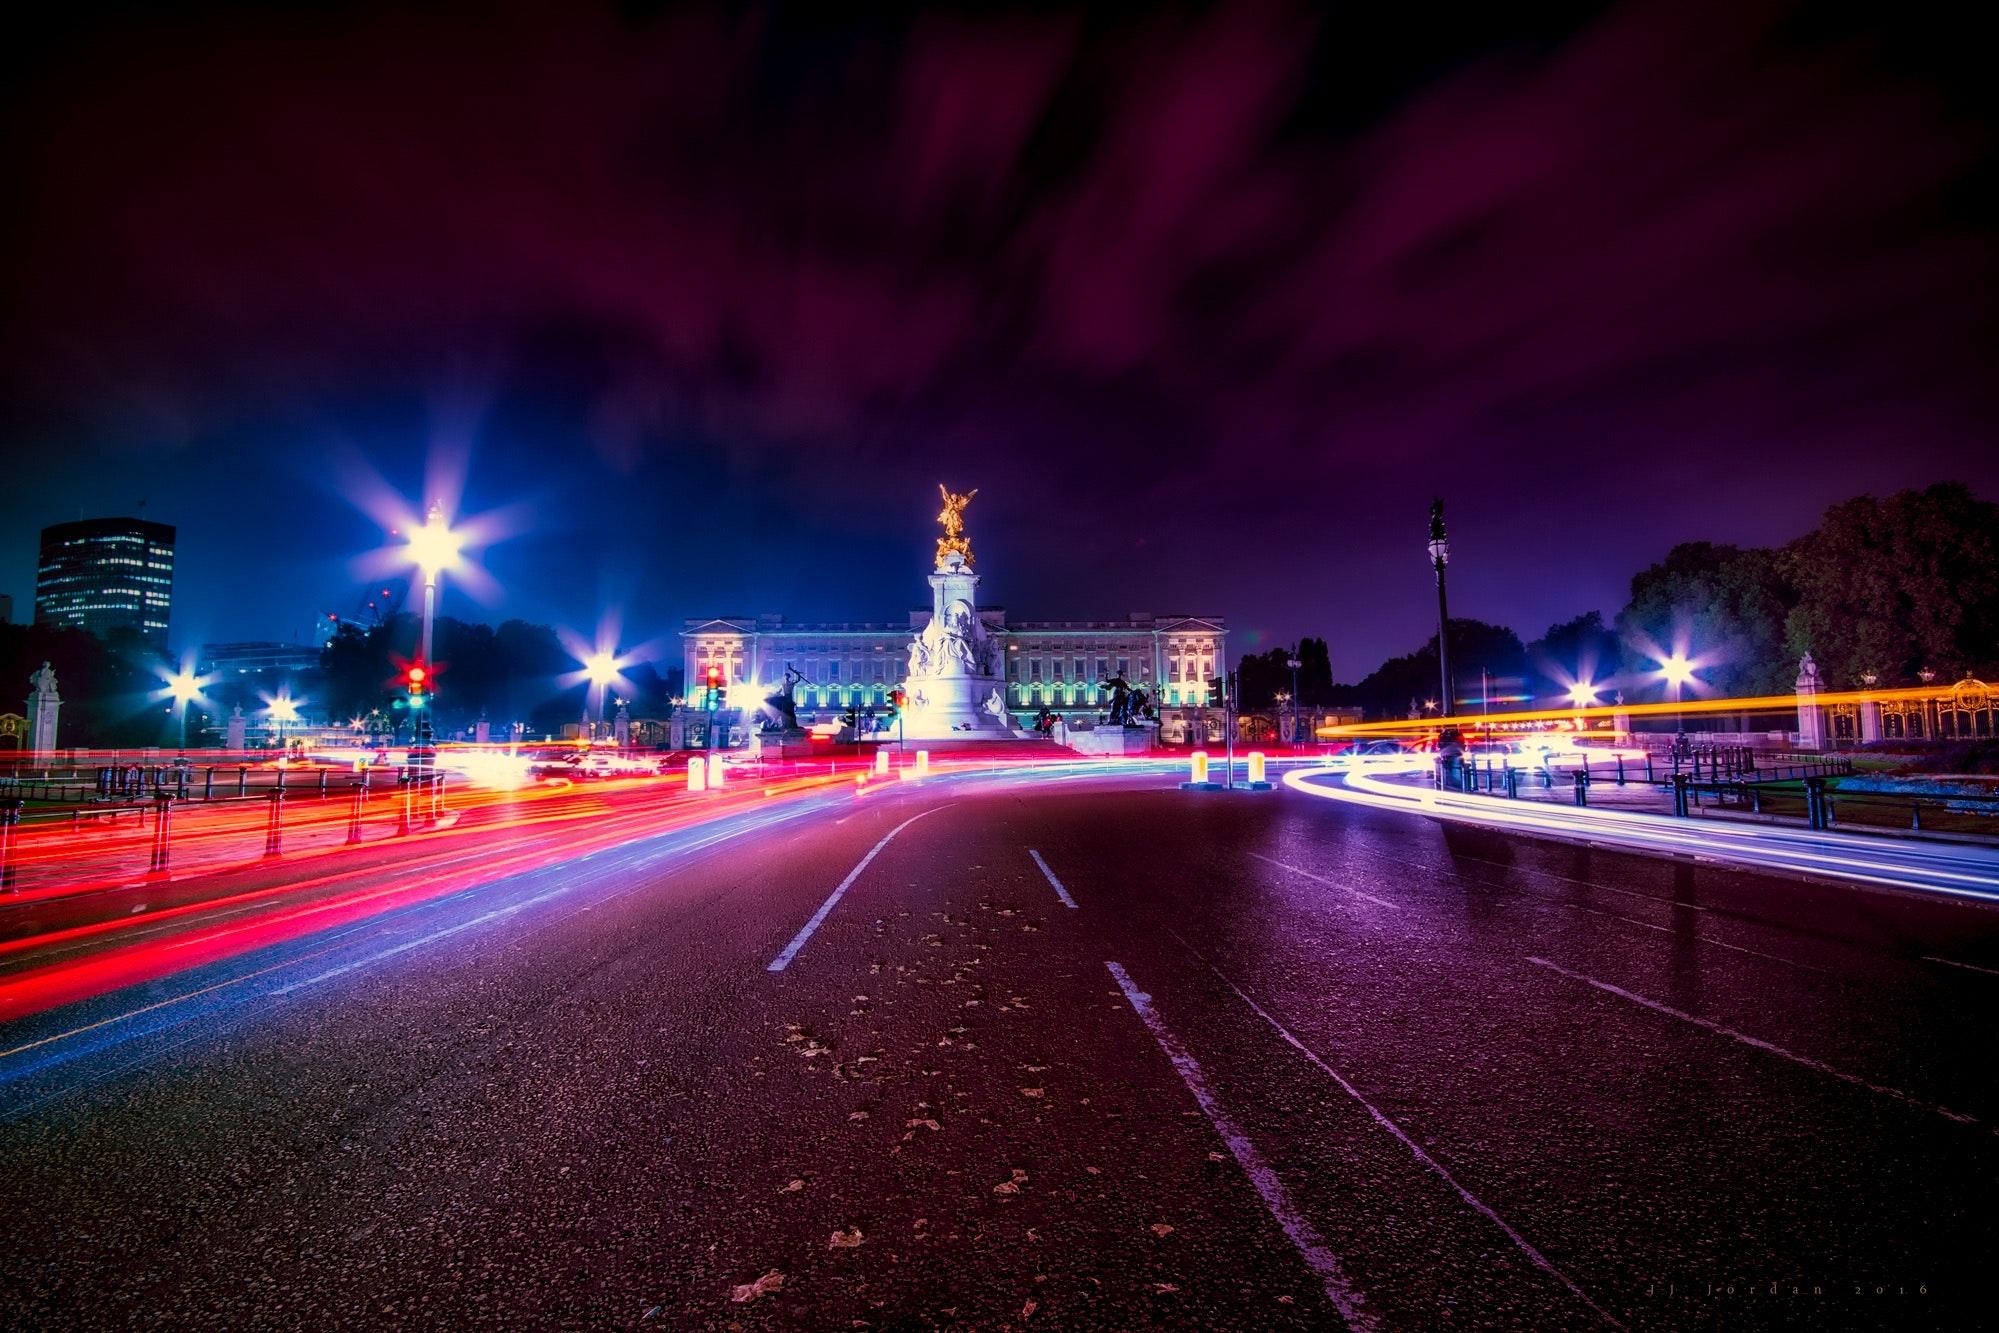 Roads at night